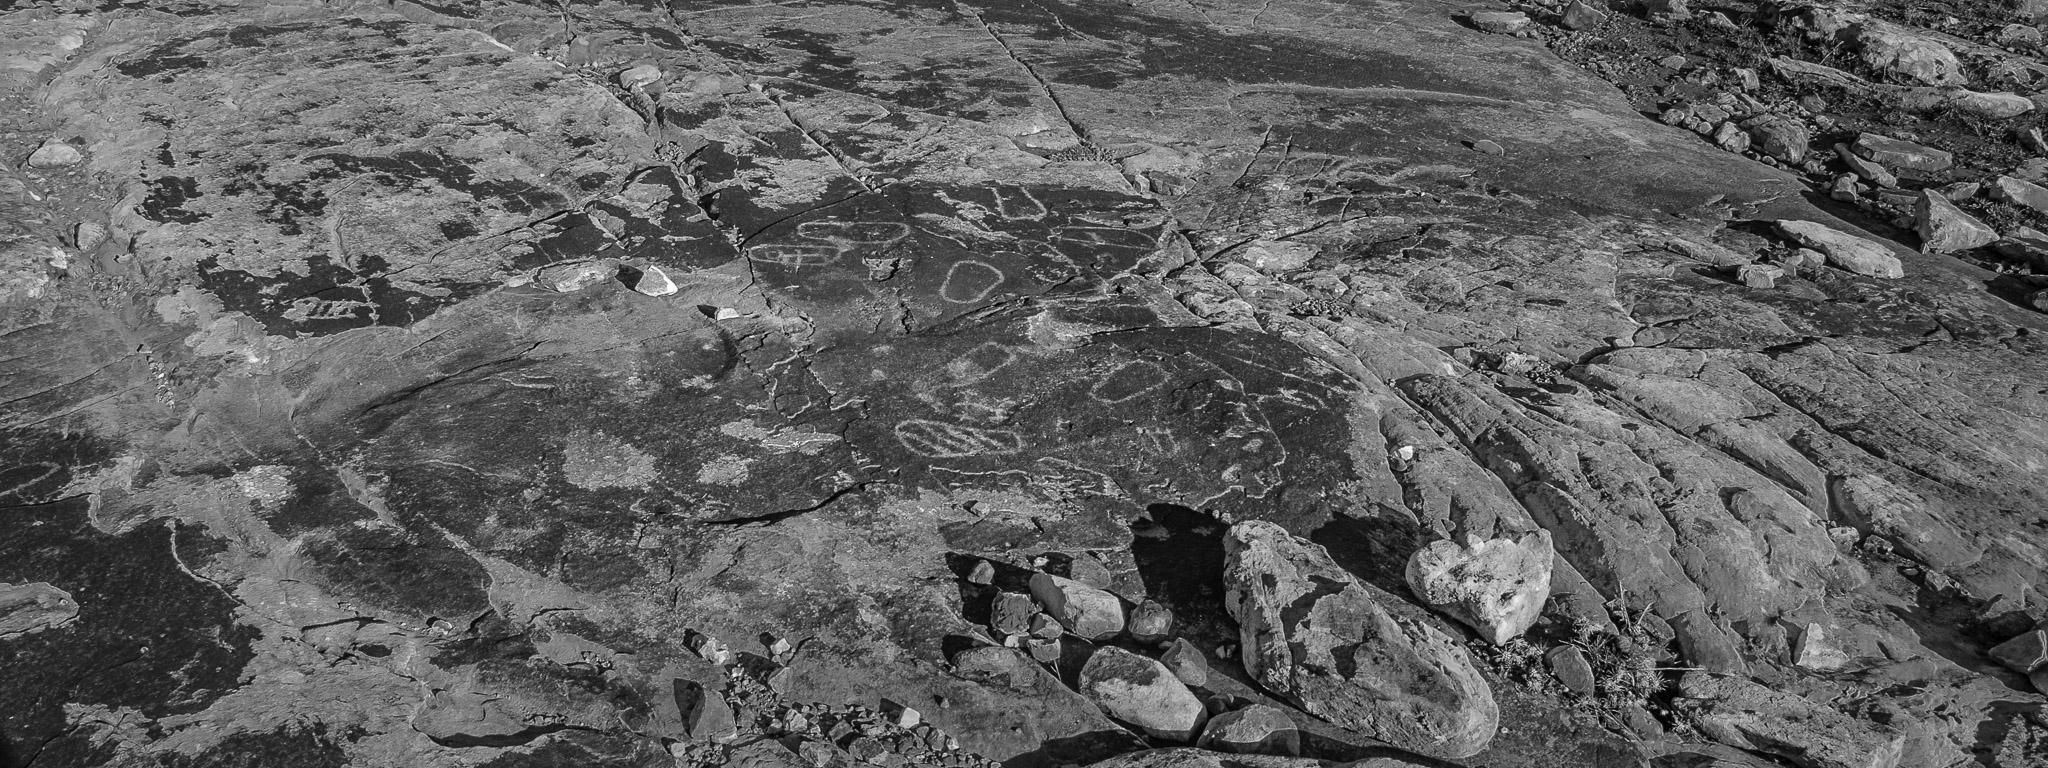 Rare horizontal petroglyph carved into desert varnish near the Harpers Corner Road in Dinosaur National Monument.